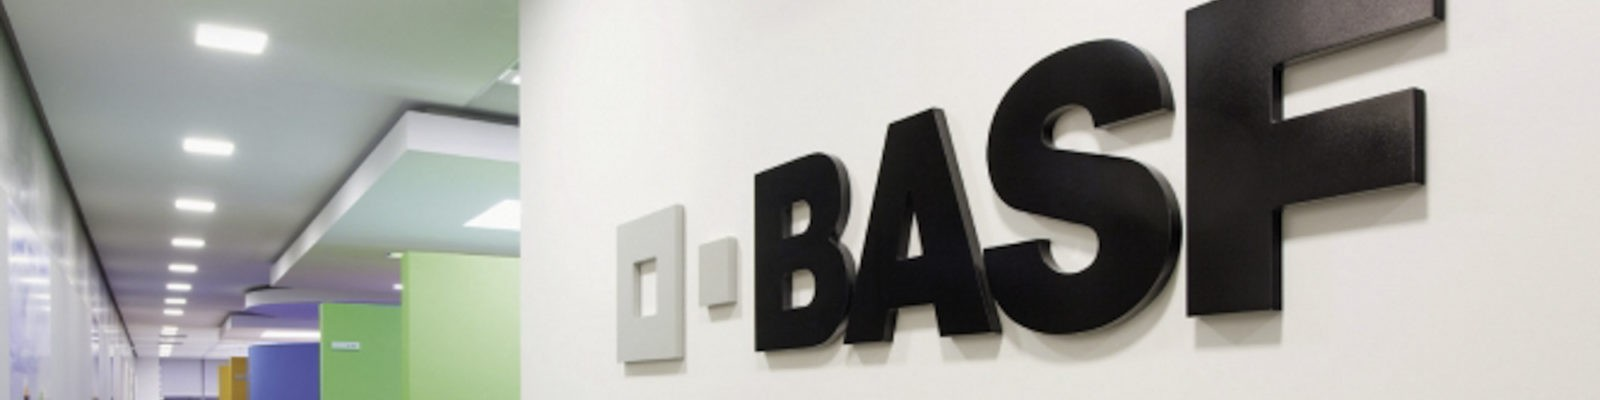 BASF компоненты пенополиуретан производитель полимочевины